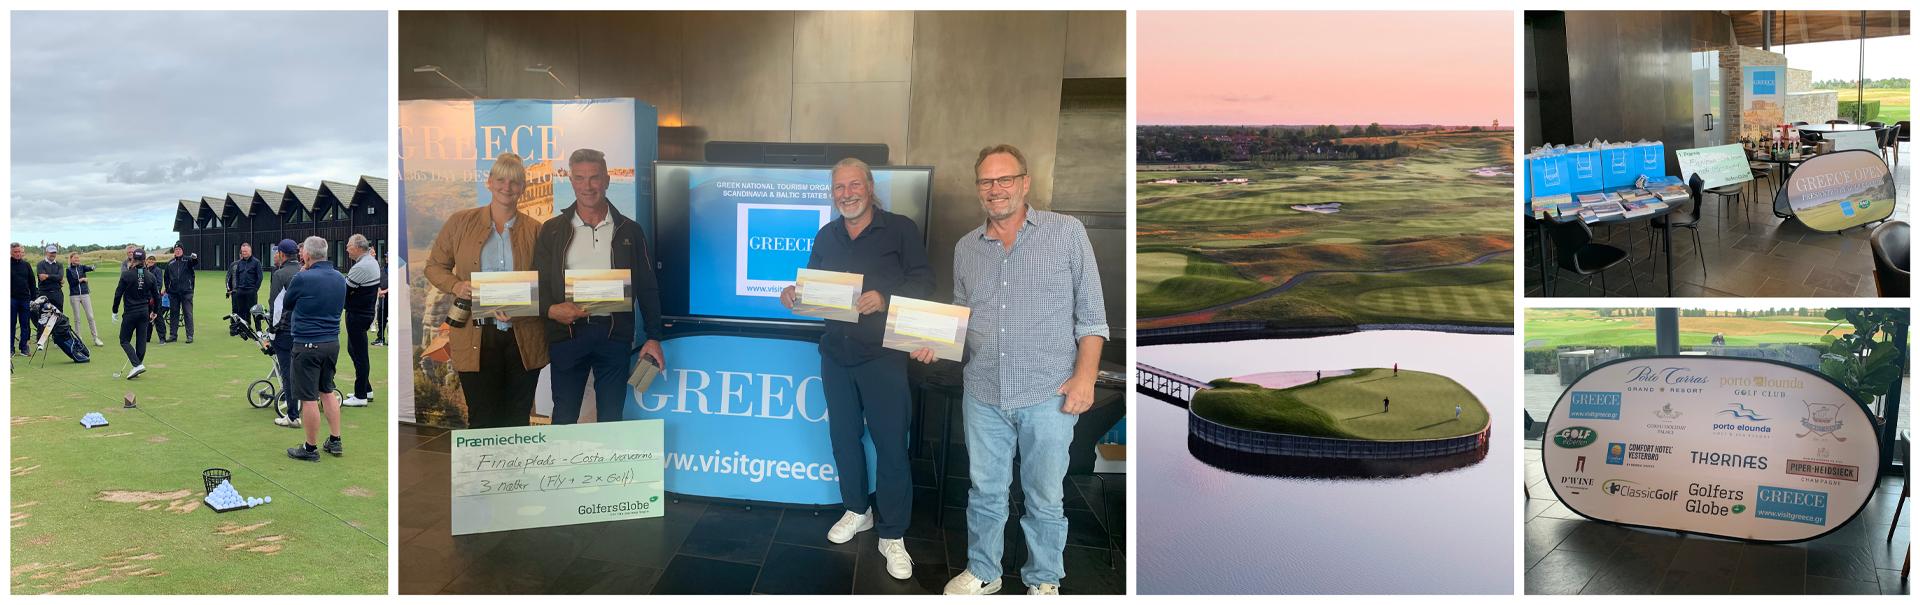 Greece Open - Presented by Golf Experten (landsfinale - Great Northern)